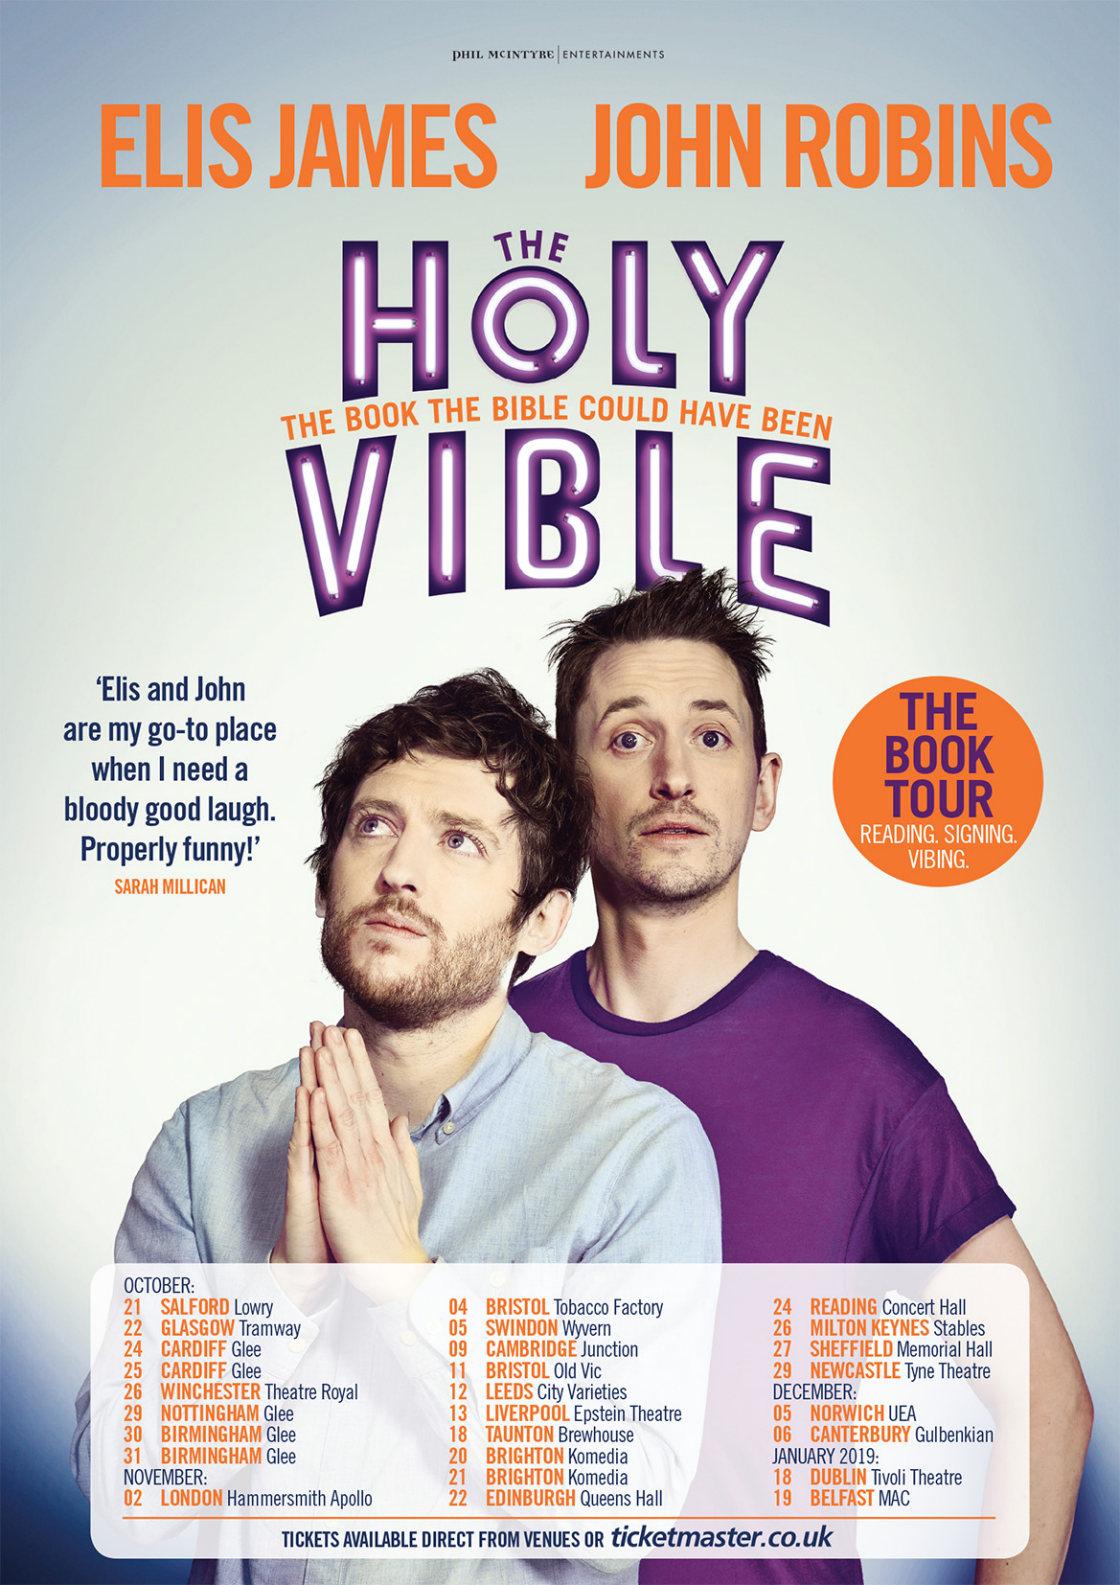 Elis James and John Robins - The Holy Vible Book tour